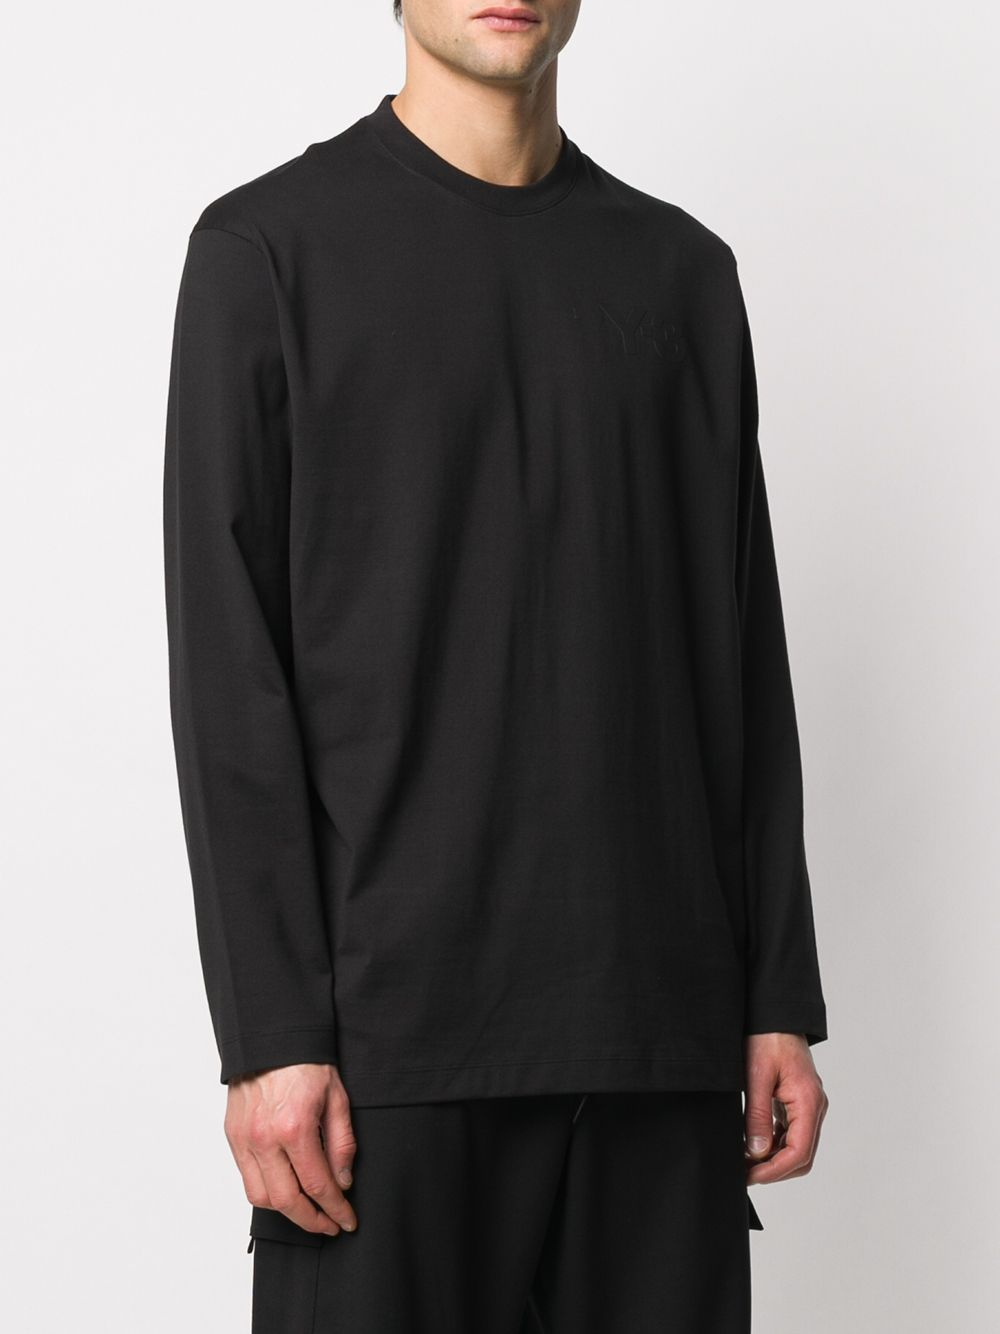 long sleeves t-shirt man black in cotton Y-3 | T-shirts | FN3361BLACK